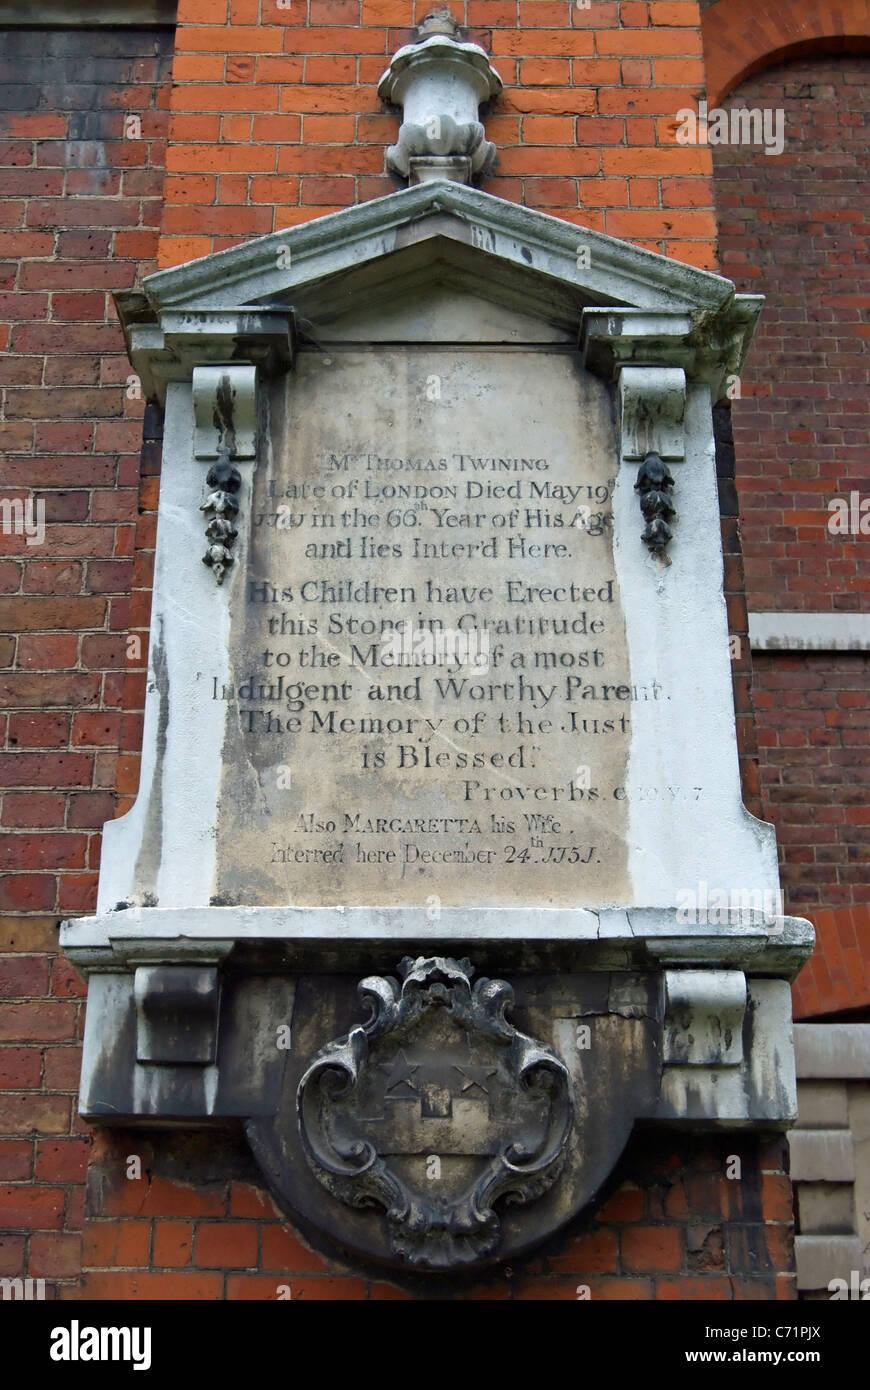 memorial to thomas twining, founder of twinings tea, at st marys church, twickenham, england - Stock Image